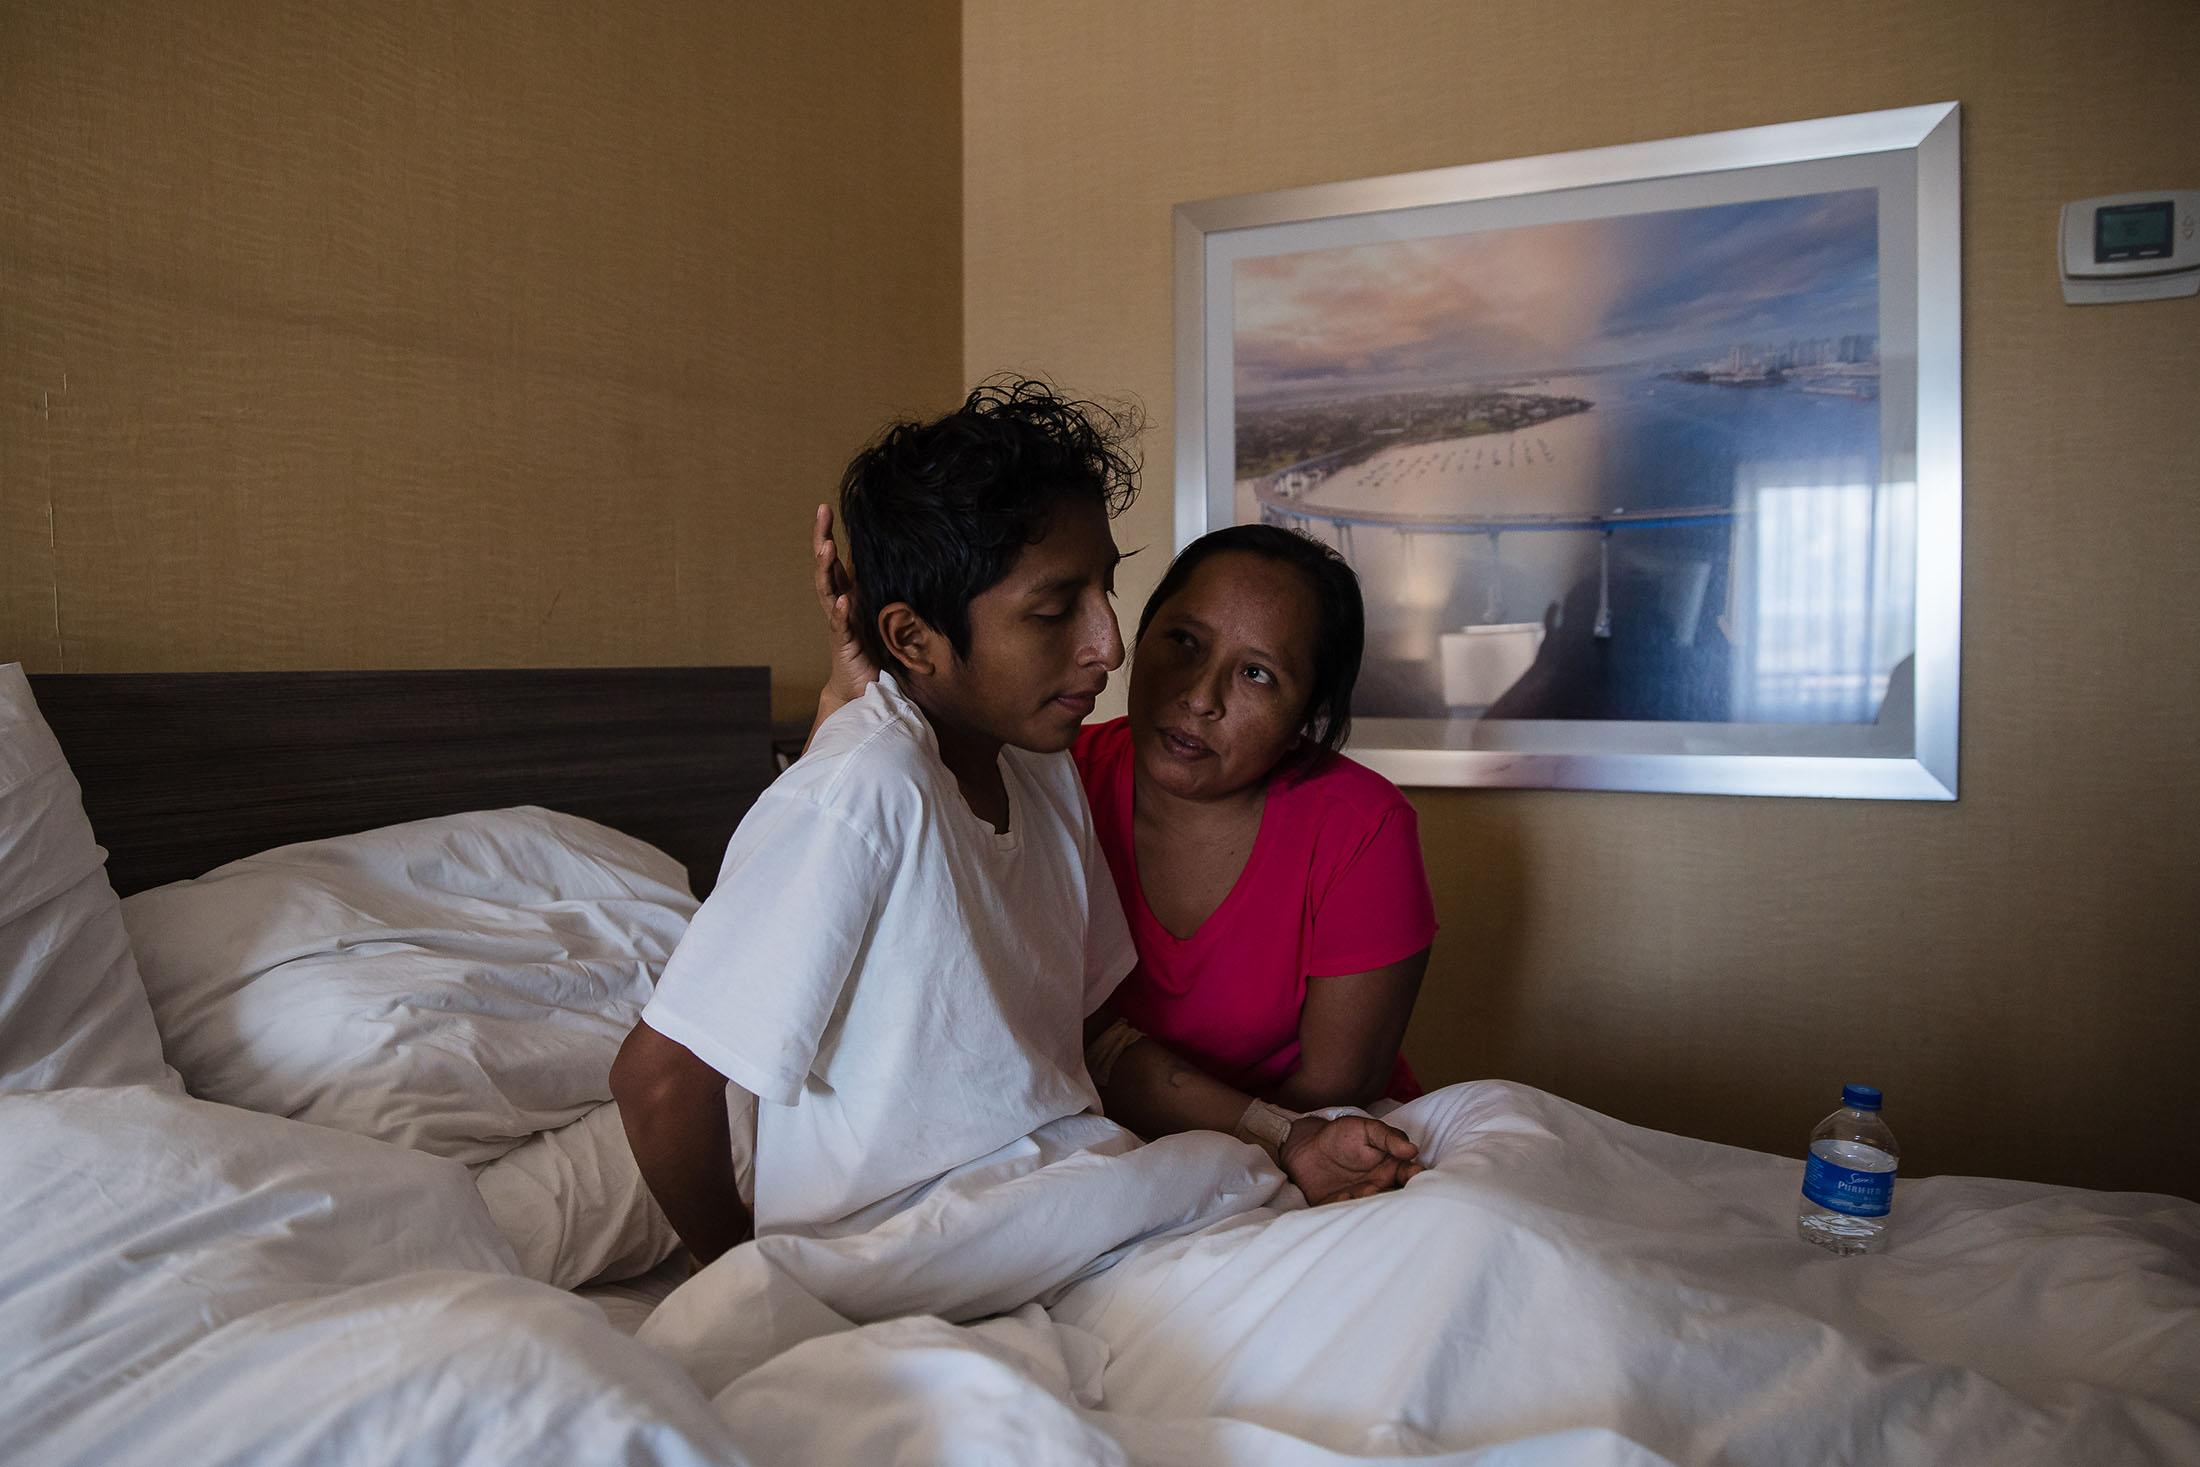 Maria Felix Martinez Gonzalez helps her son Jose Eduardo Martinez Gonzalez, 16 years old sit up in his hotel bed in San Diego, California on March, 11, 2021.